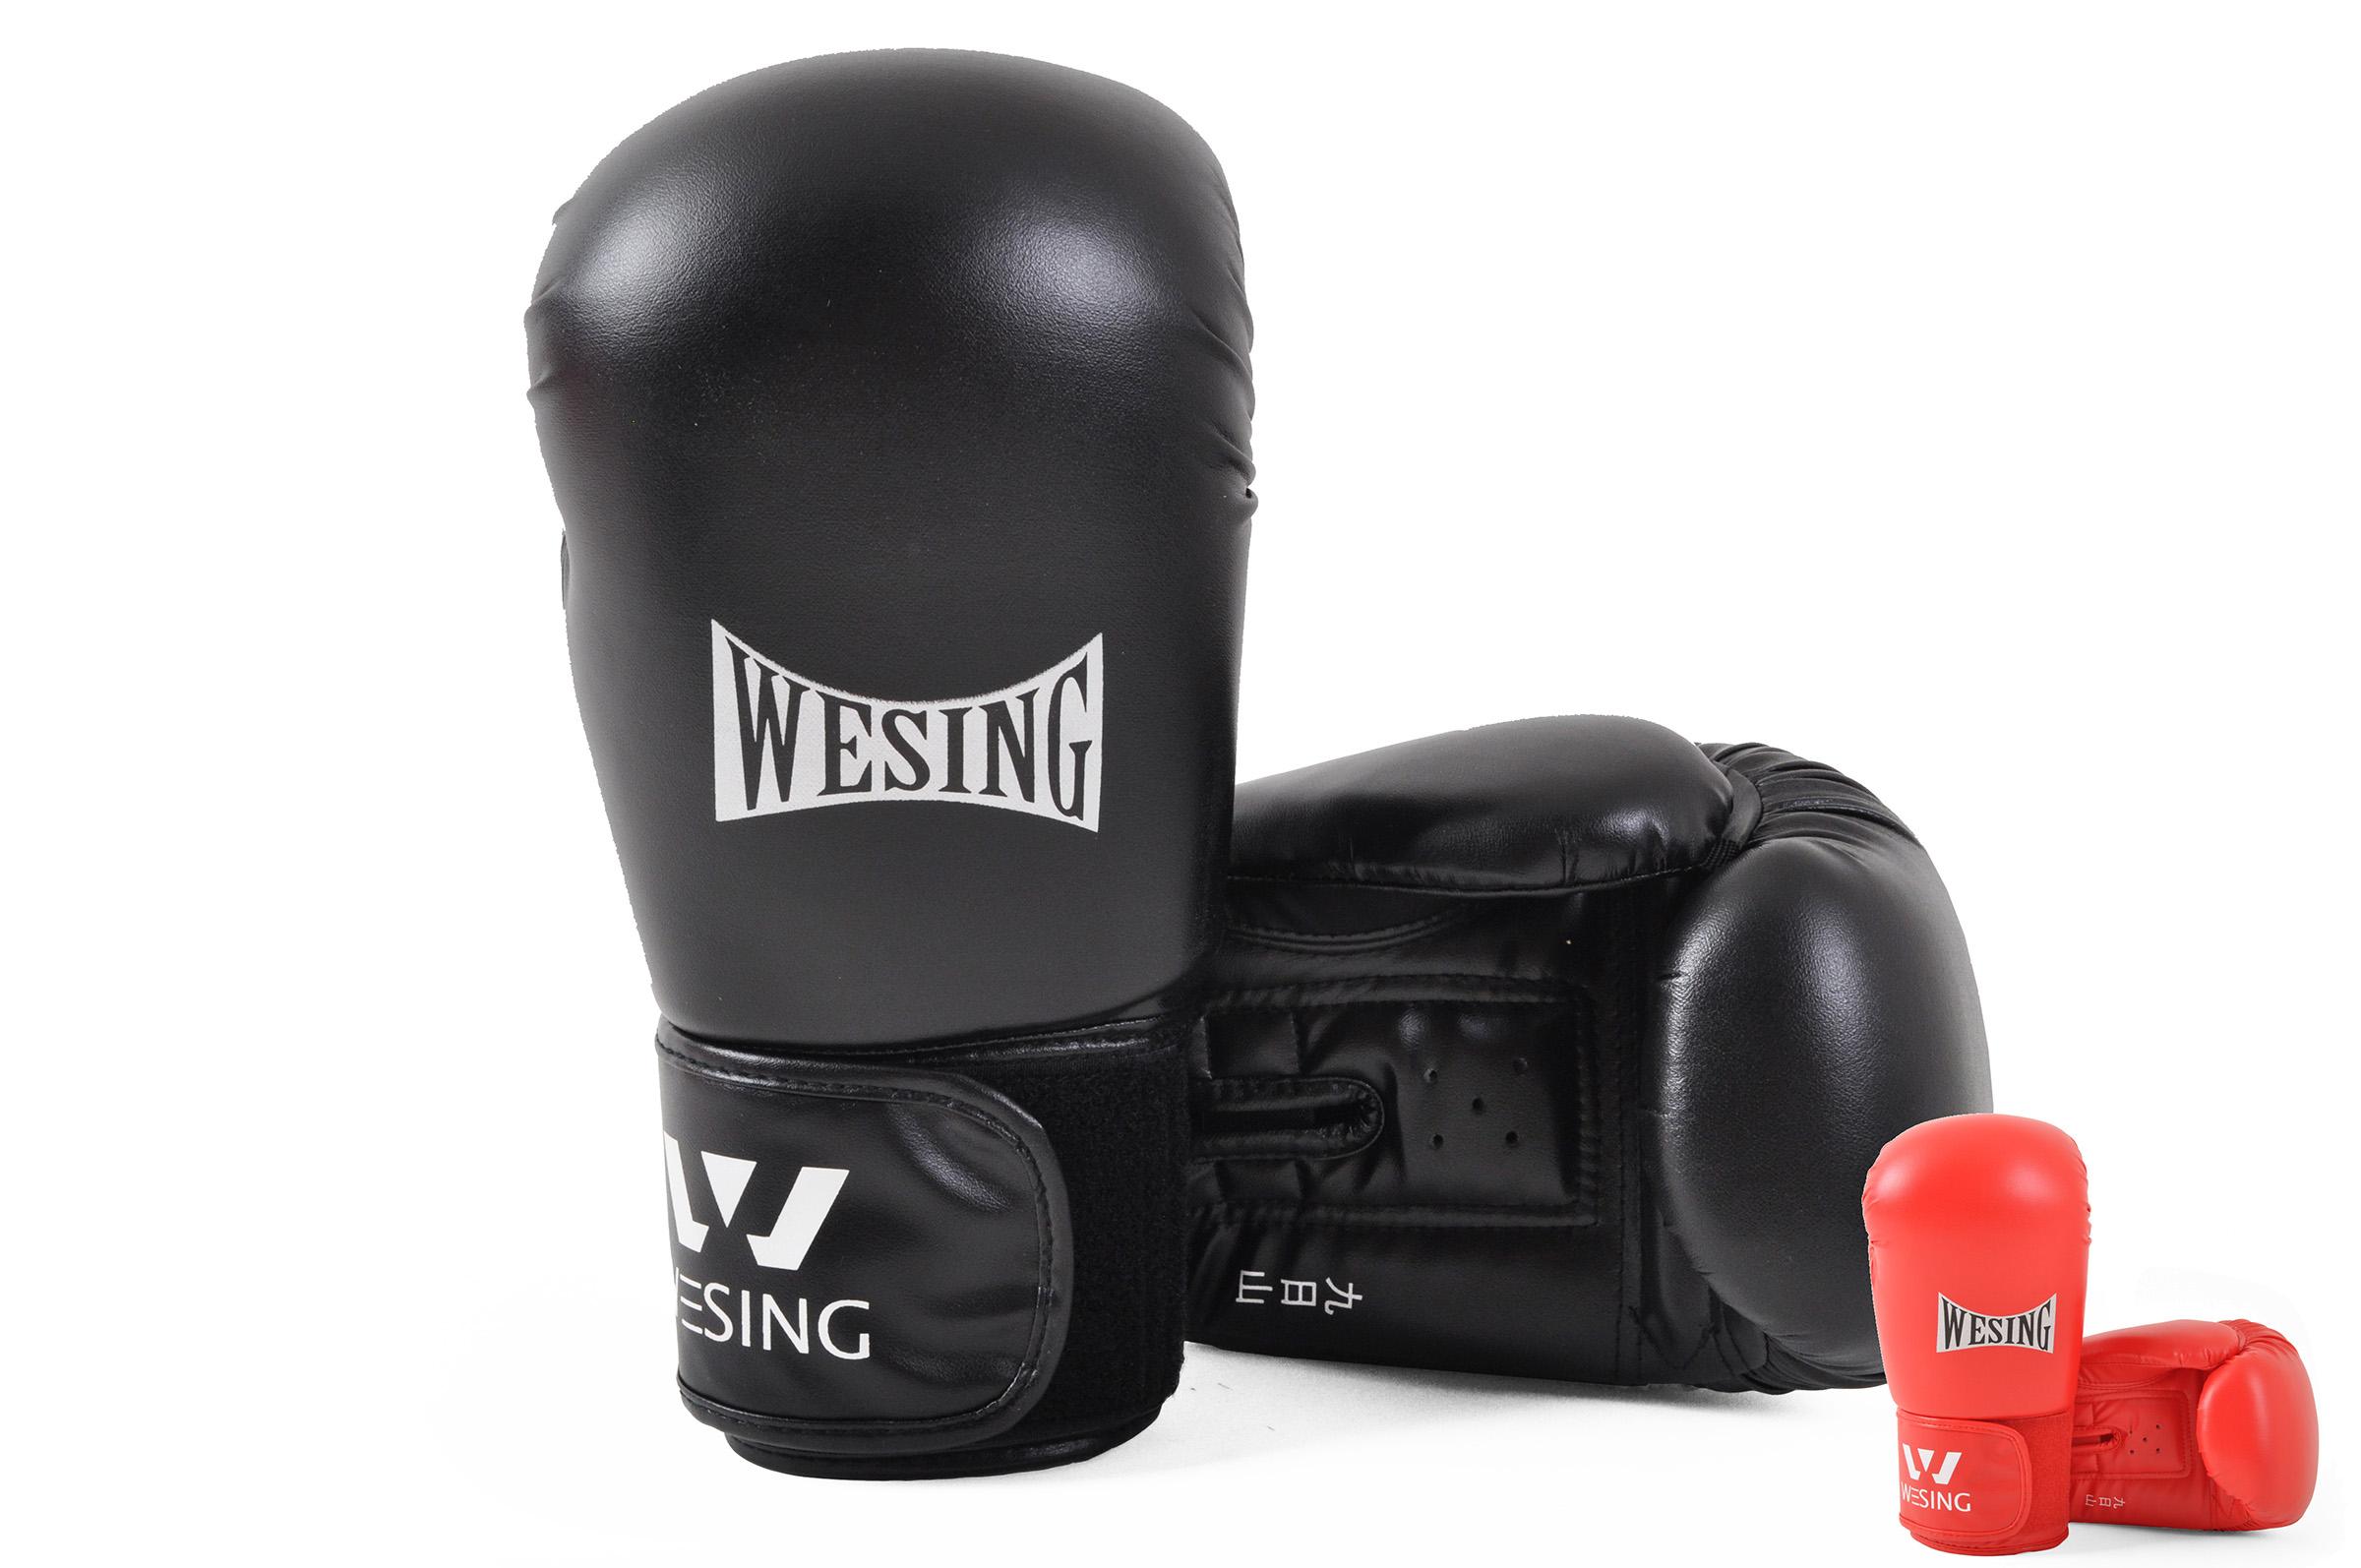 sanda chinese boxing gloves wesing pu. Black Bedroom Furniture Sets. Home Design Ideas